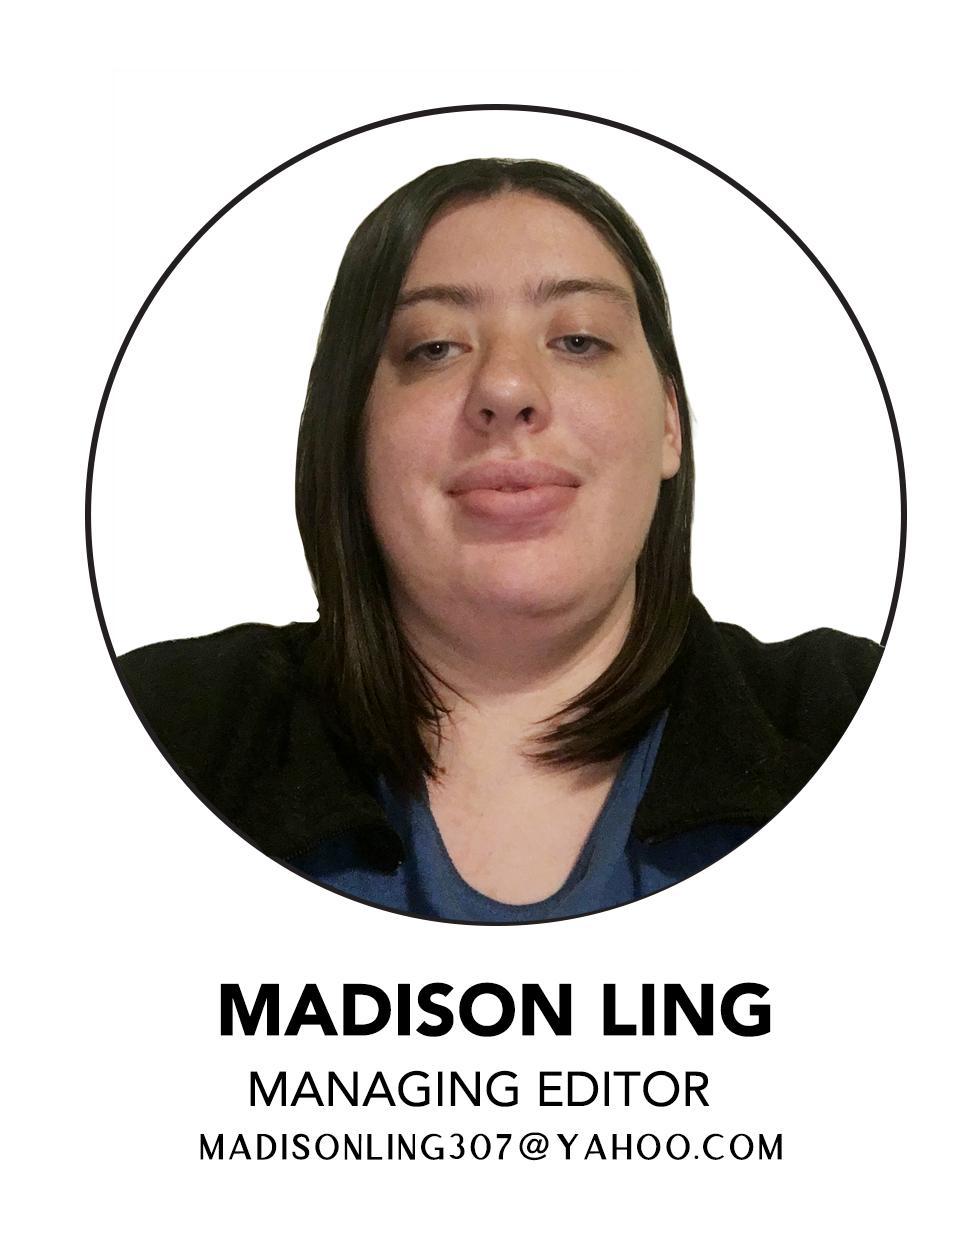 madison ling